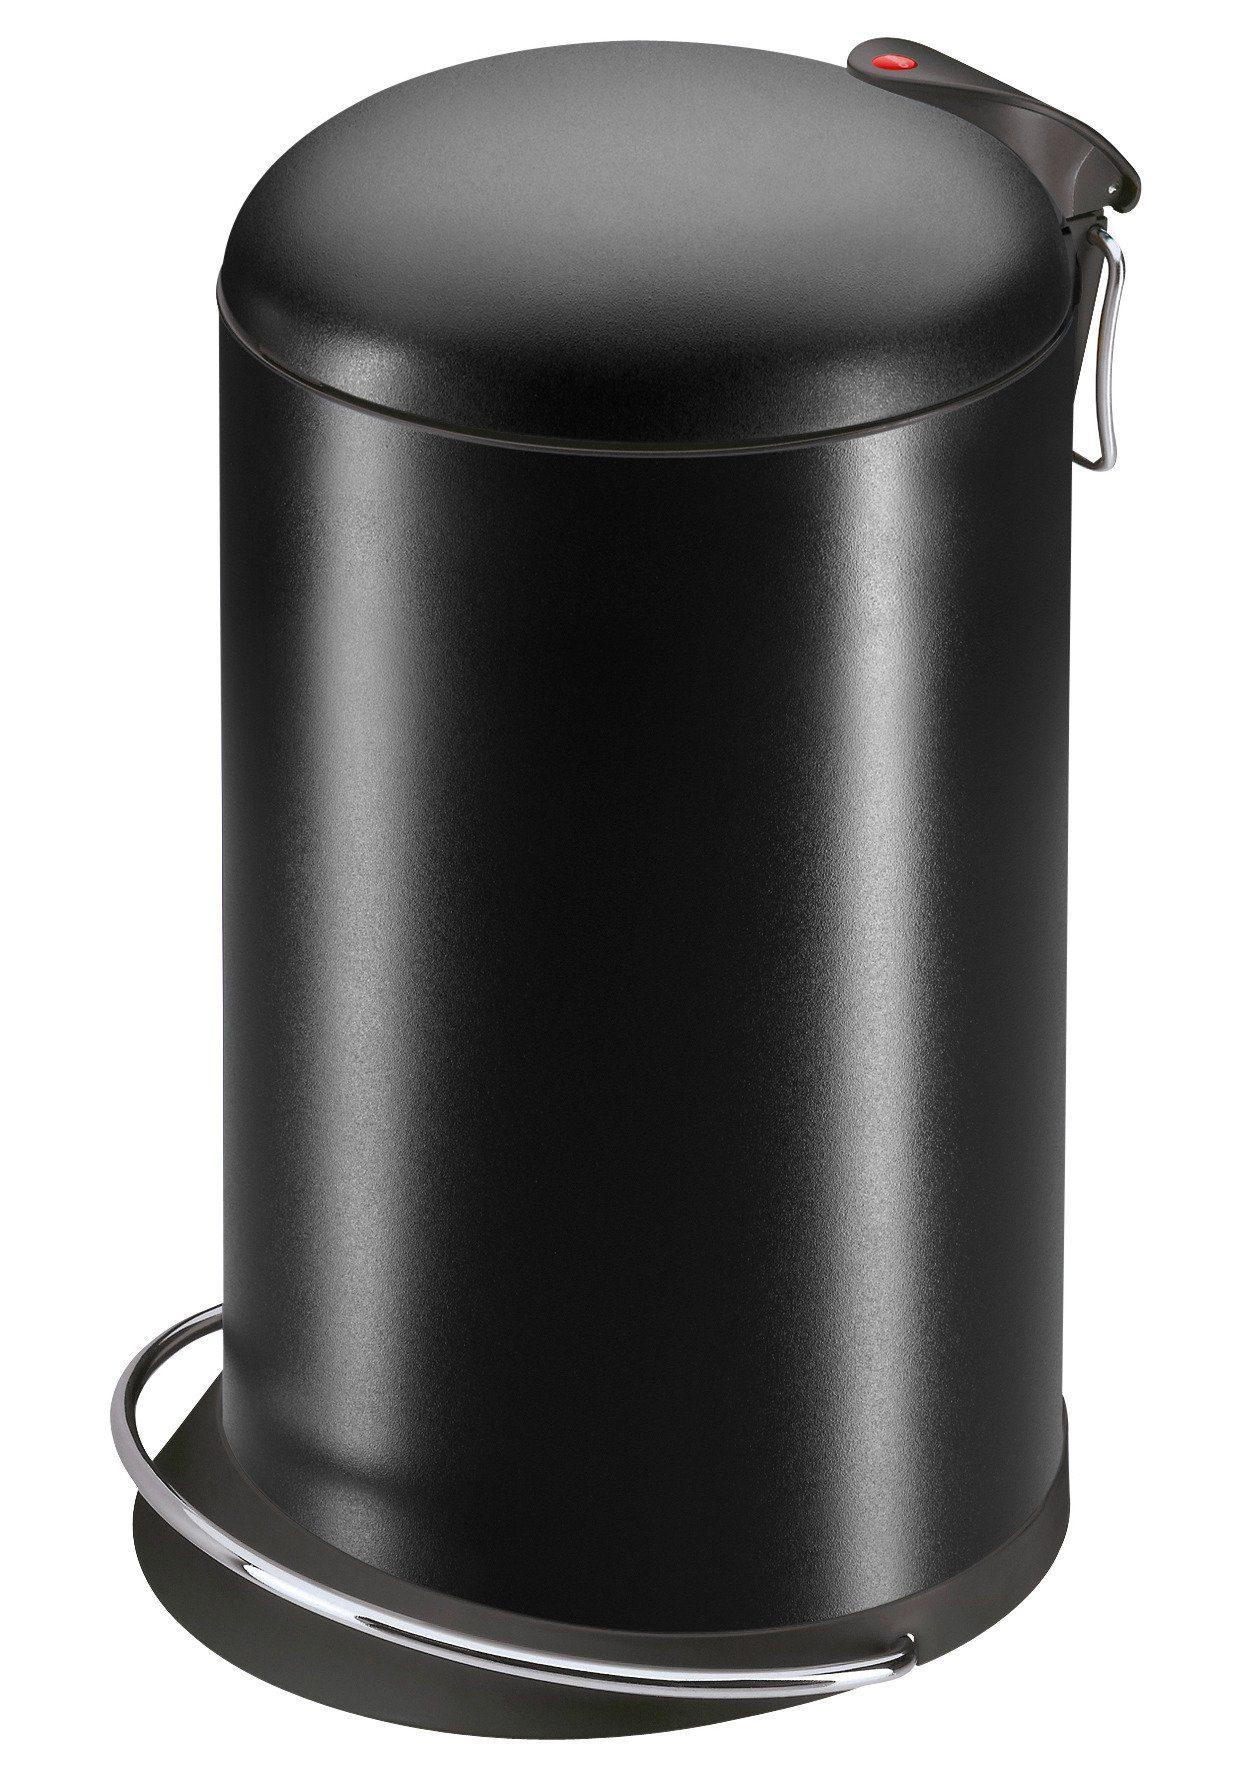 Hailo Tret-Abfallsammler »TopDesign 16«, schwarz